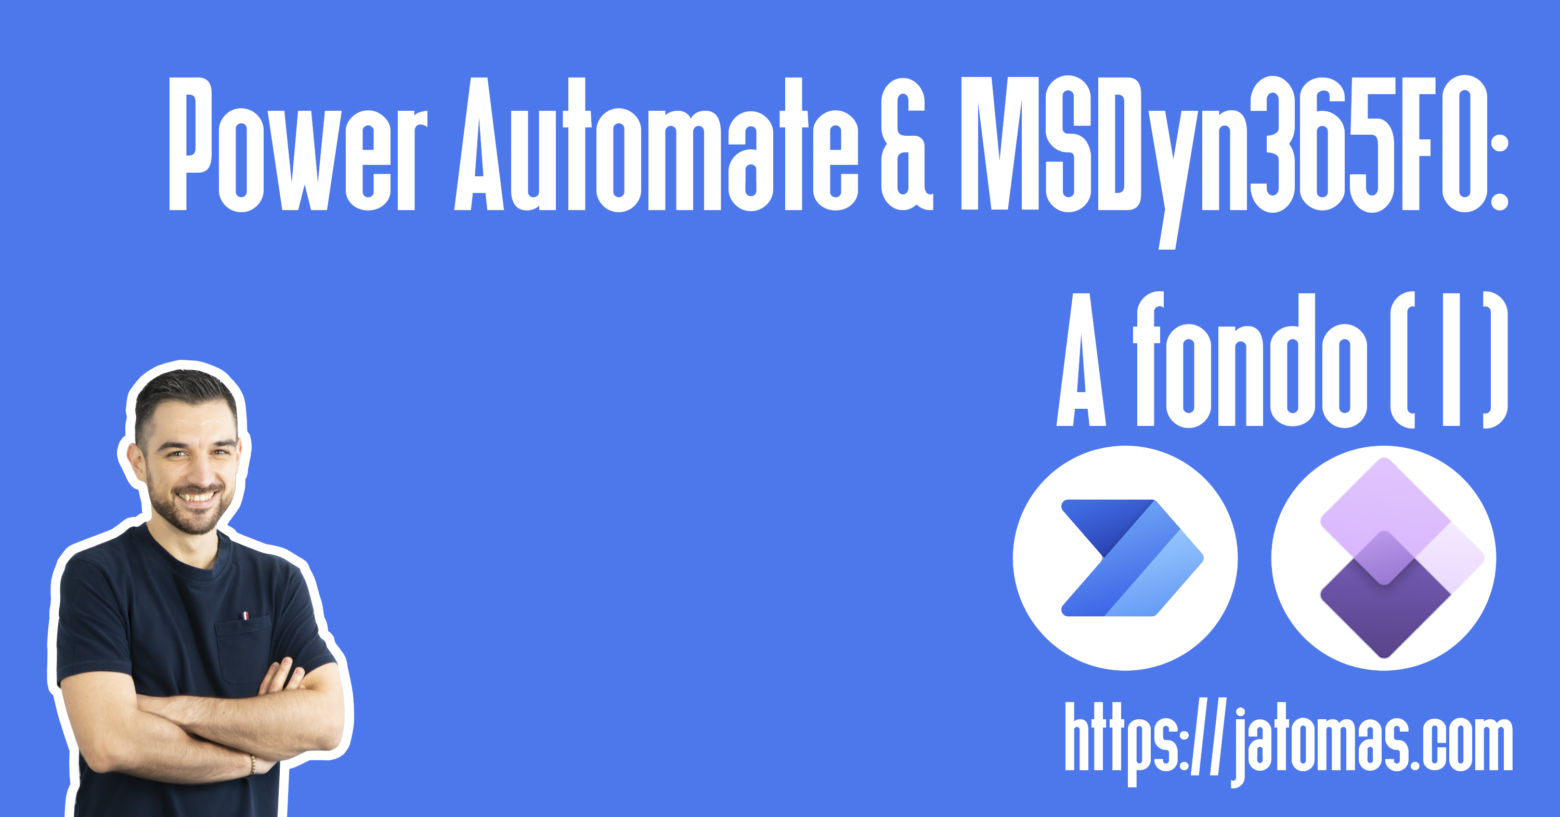 Power Automate & MSDyn365FO: A fondo (I)